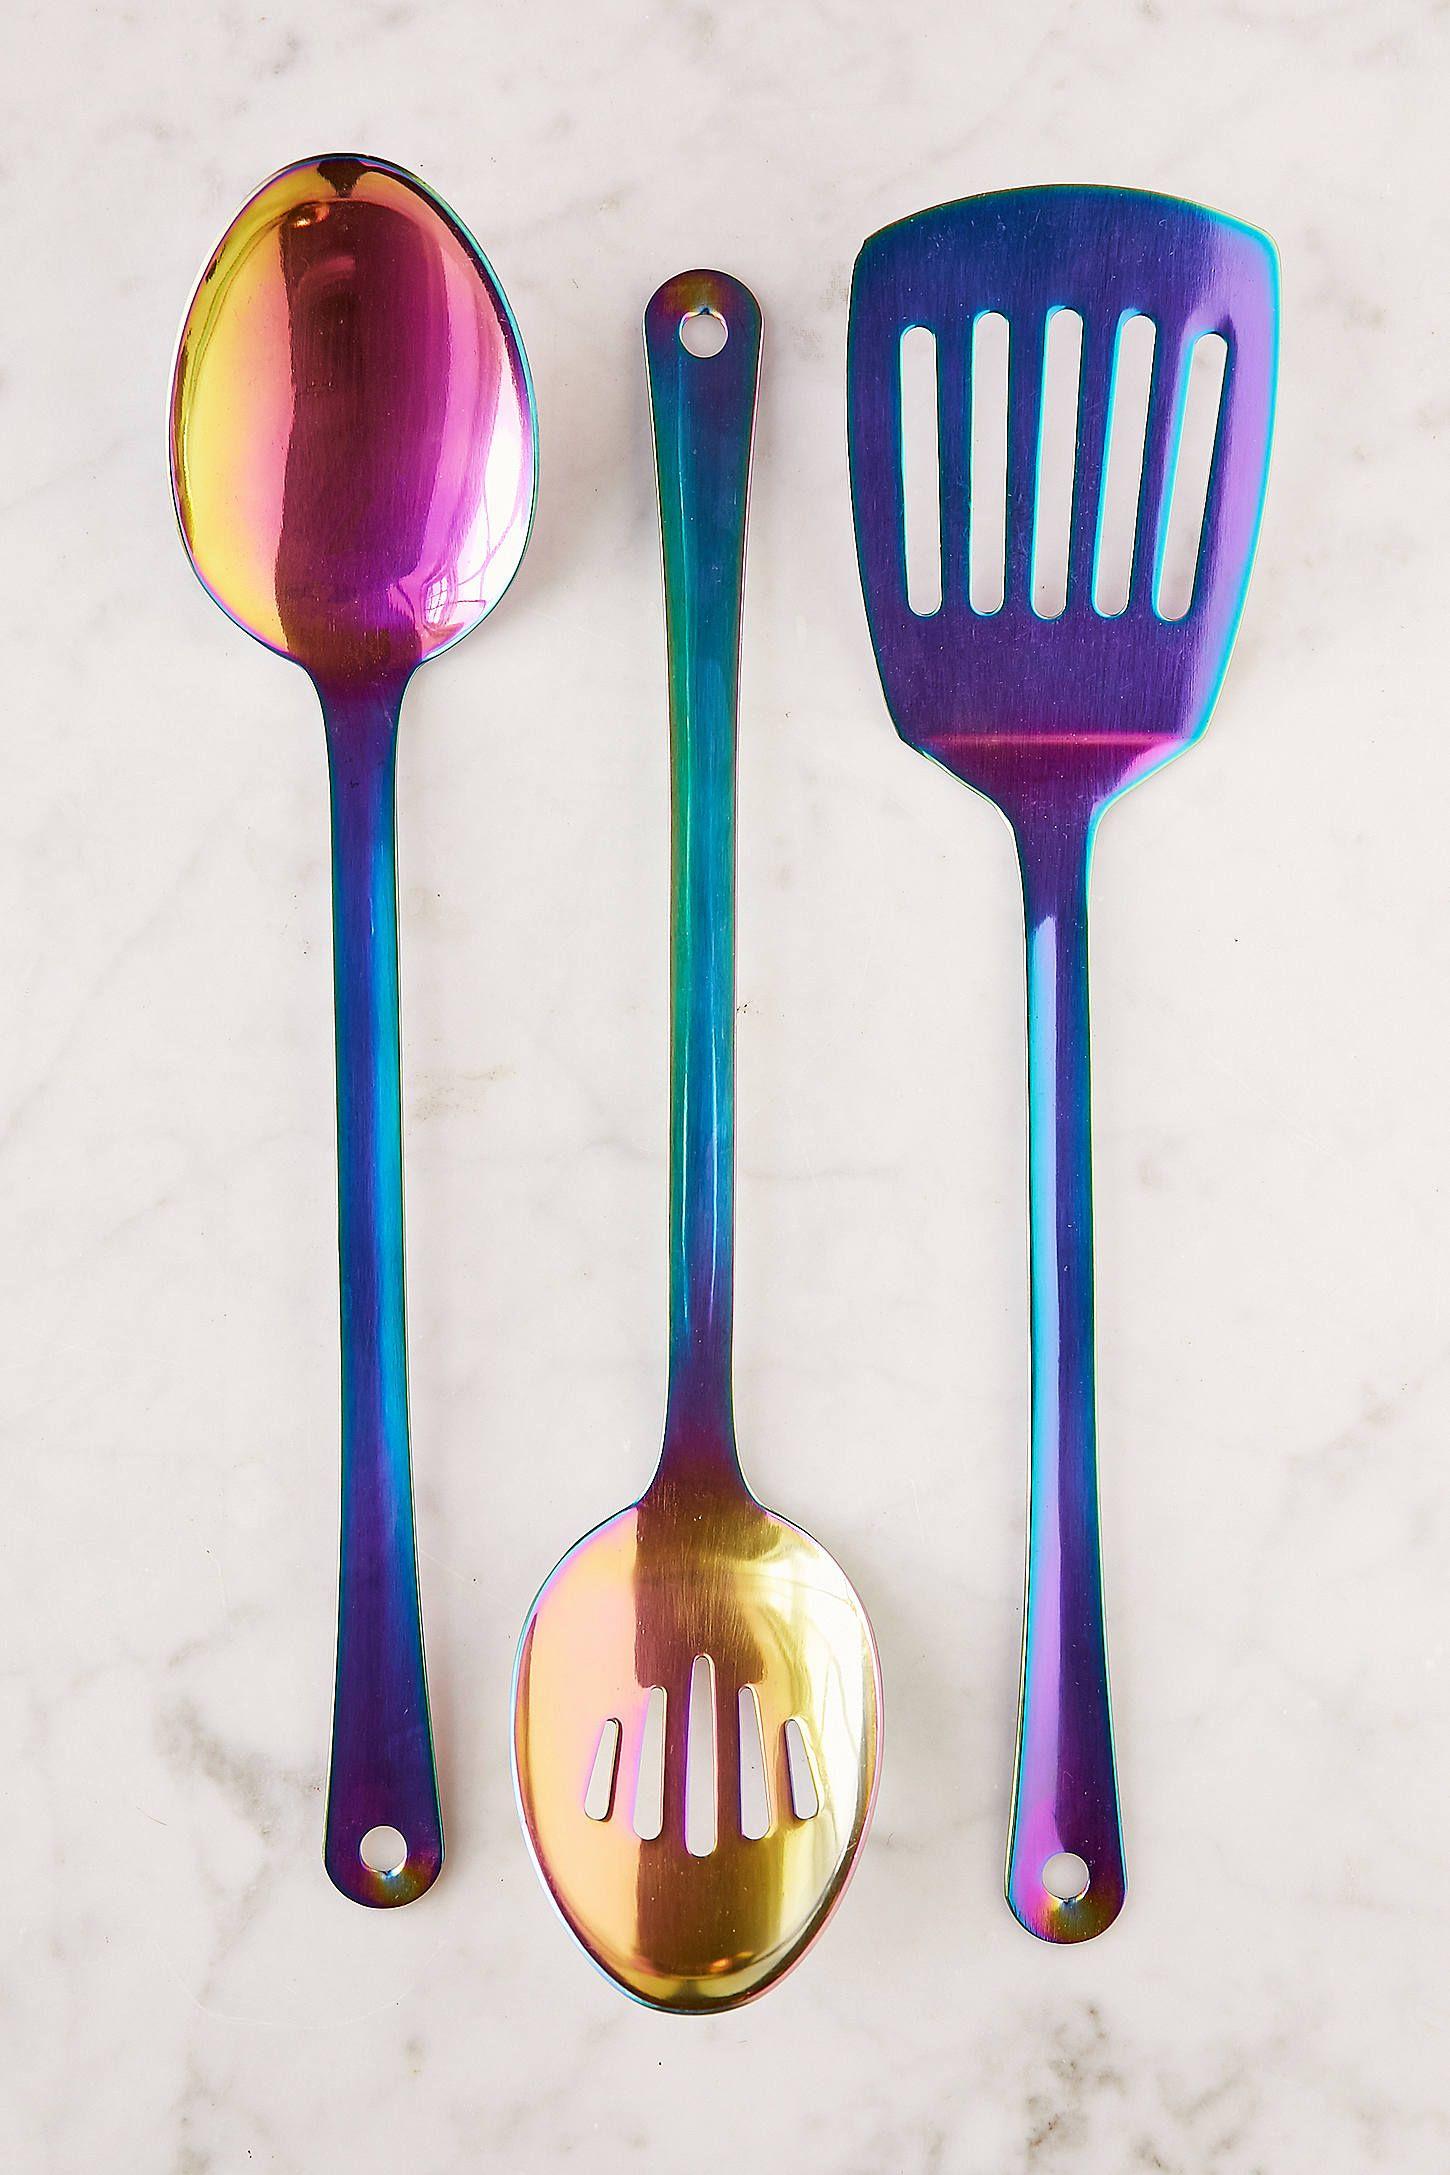 3-Piece Metallic Serving Utensil Set | Kitchen cutlery, Utensils and ...